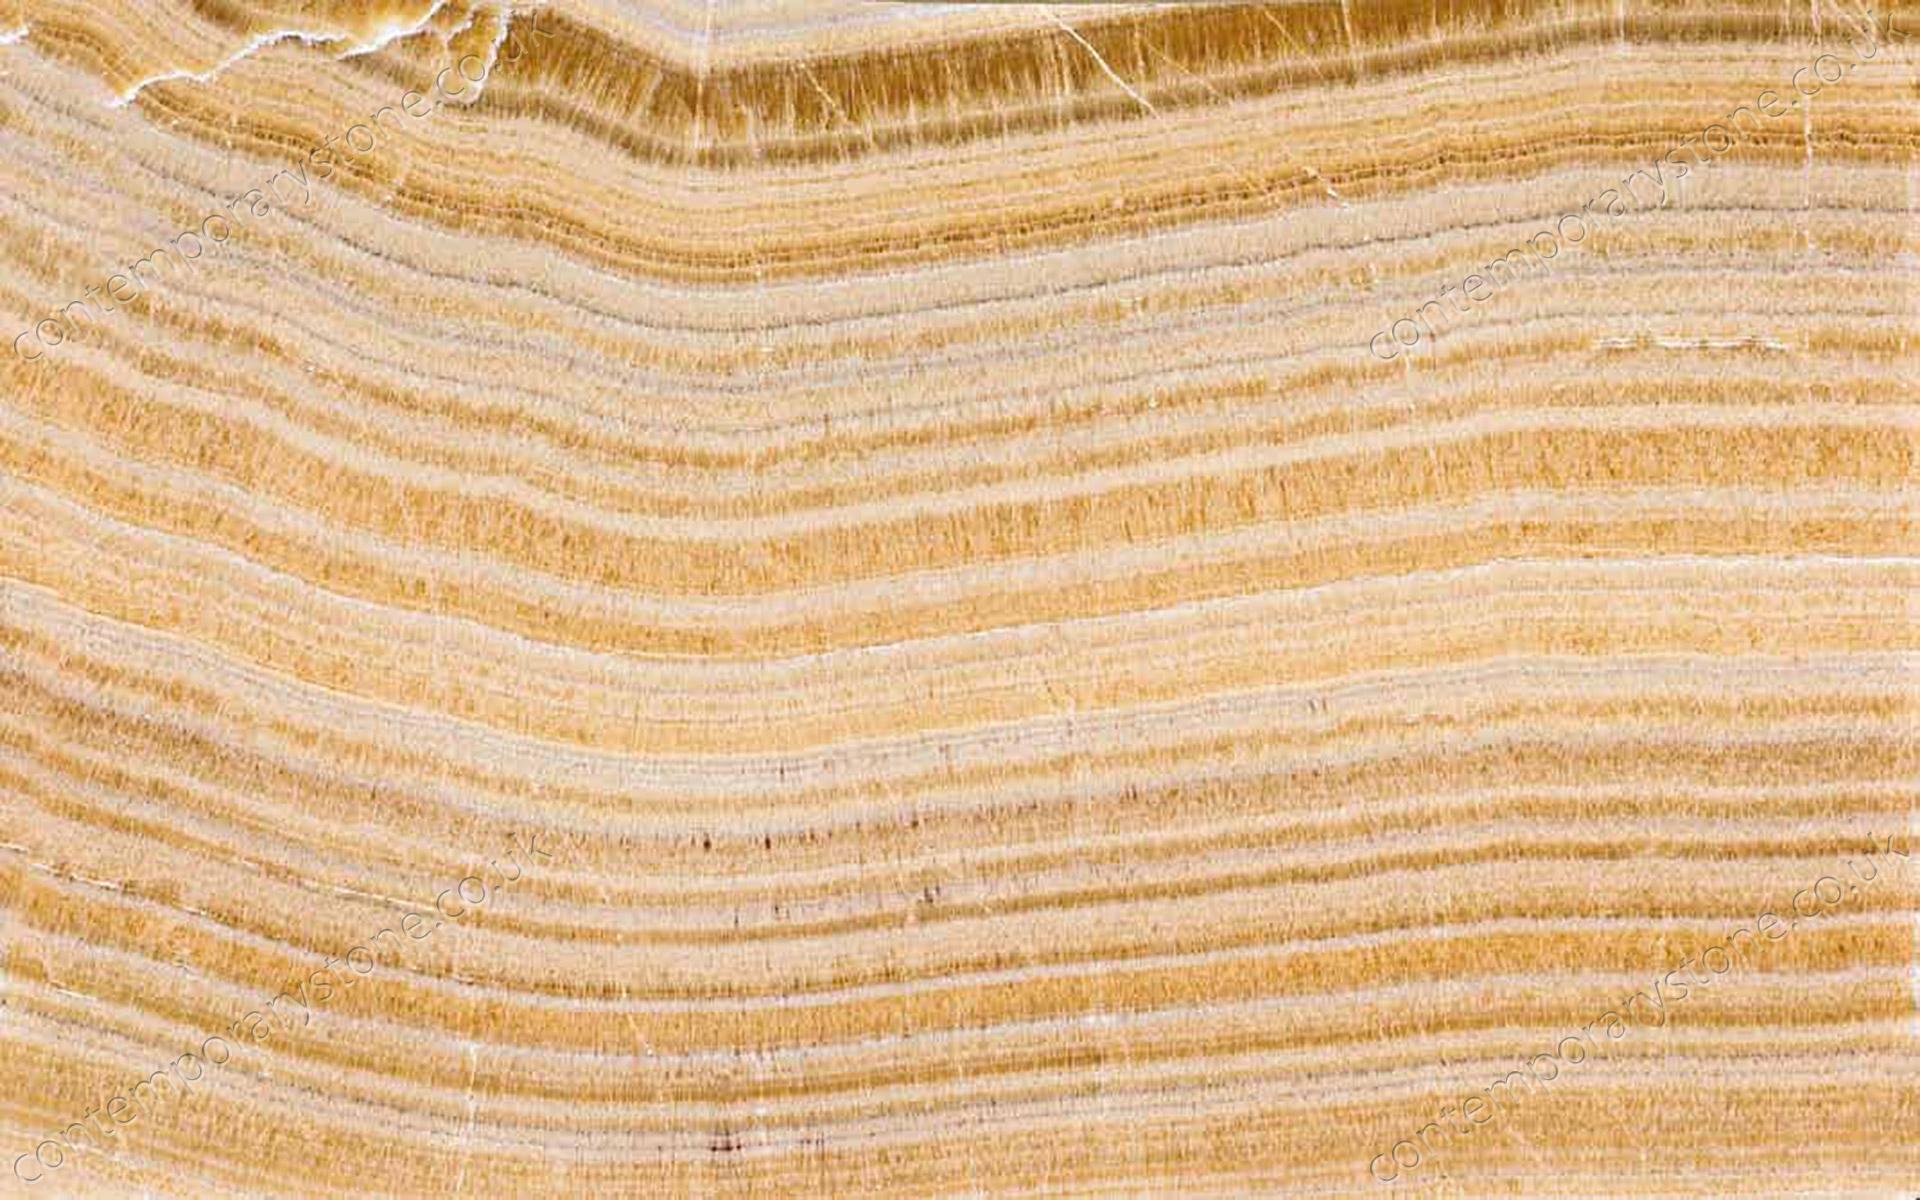 Onice Arco Iris vc onyx close-up